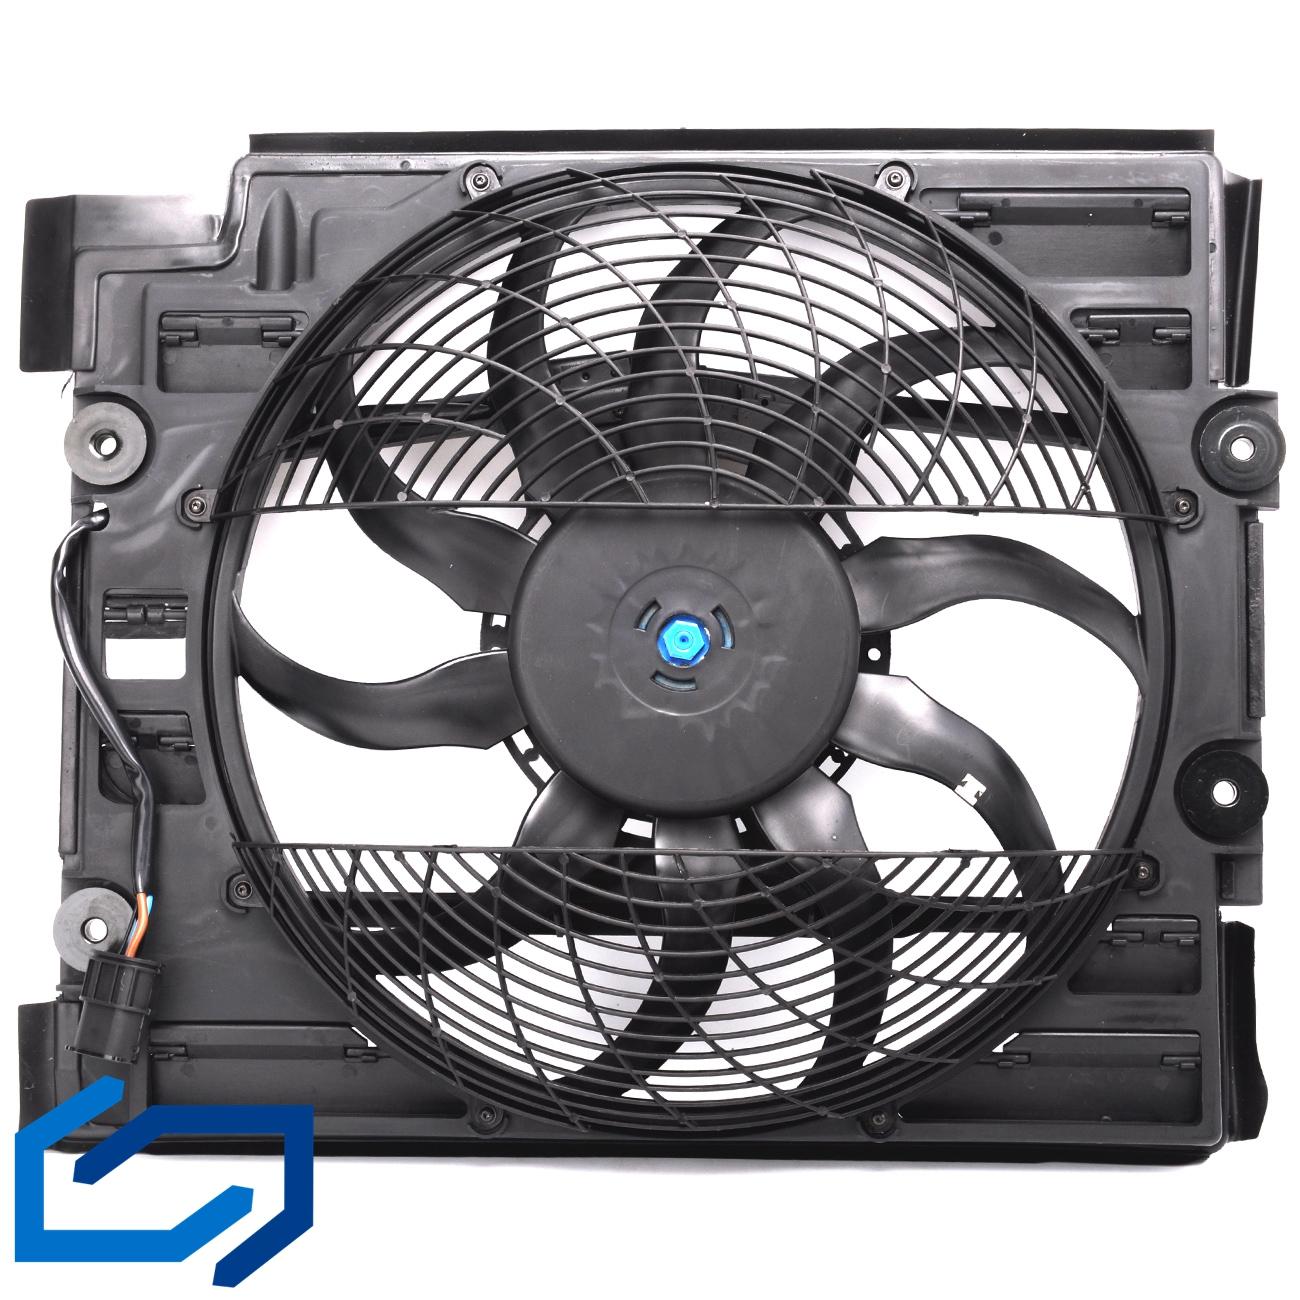 TOPAZ 64546921395 Druckl/üfter L/üfter Klimakondensator 64546921395 f/ür E39